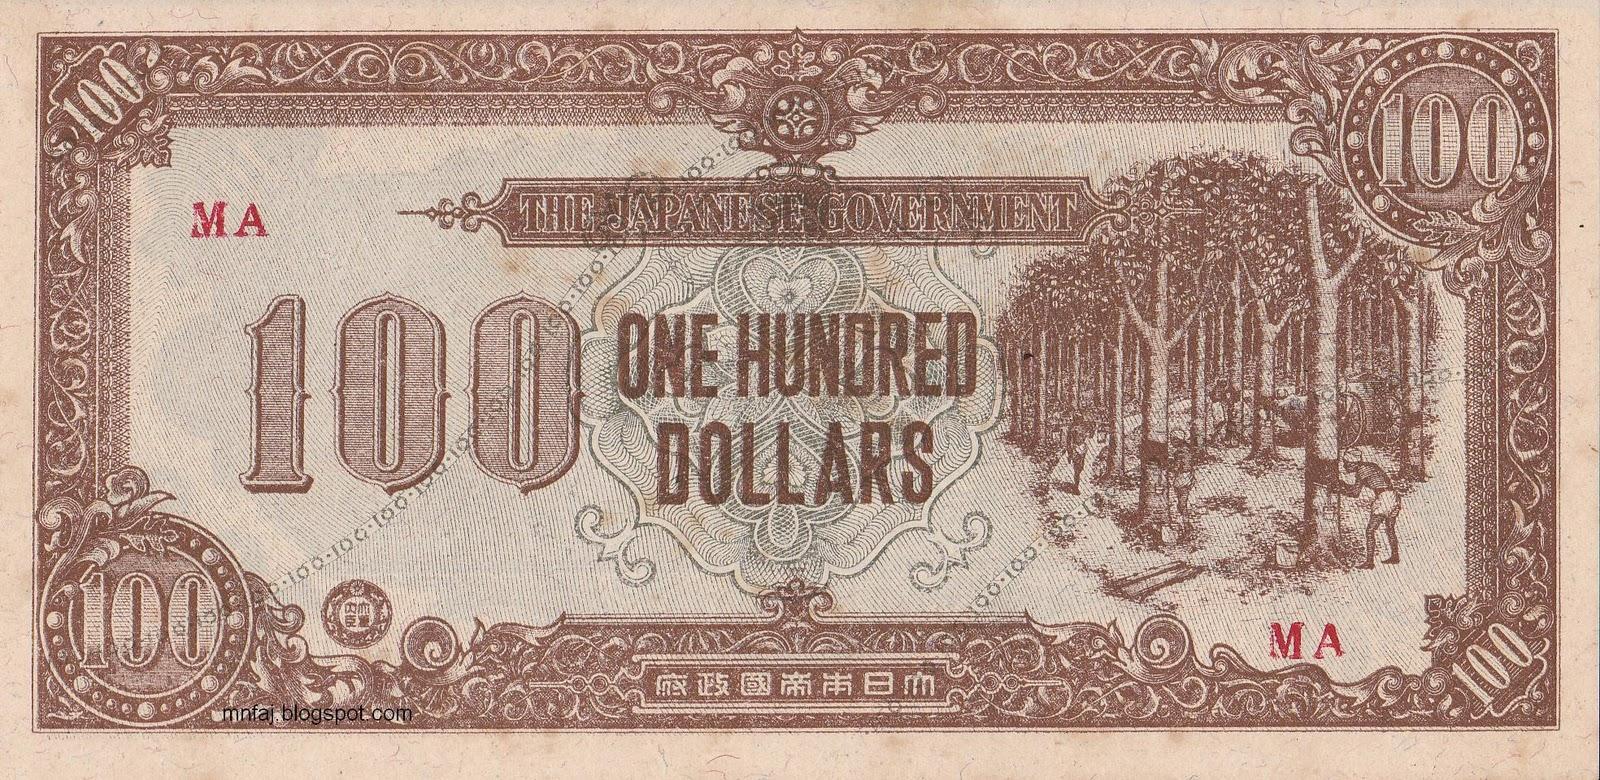 Mnfaj S Coin And Banknotes 36 Malaya Japanese Invasion